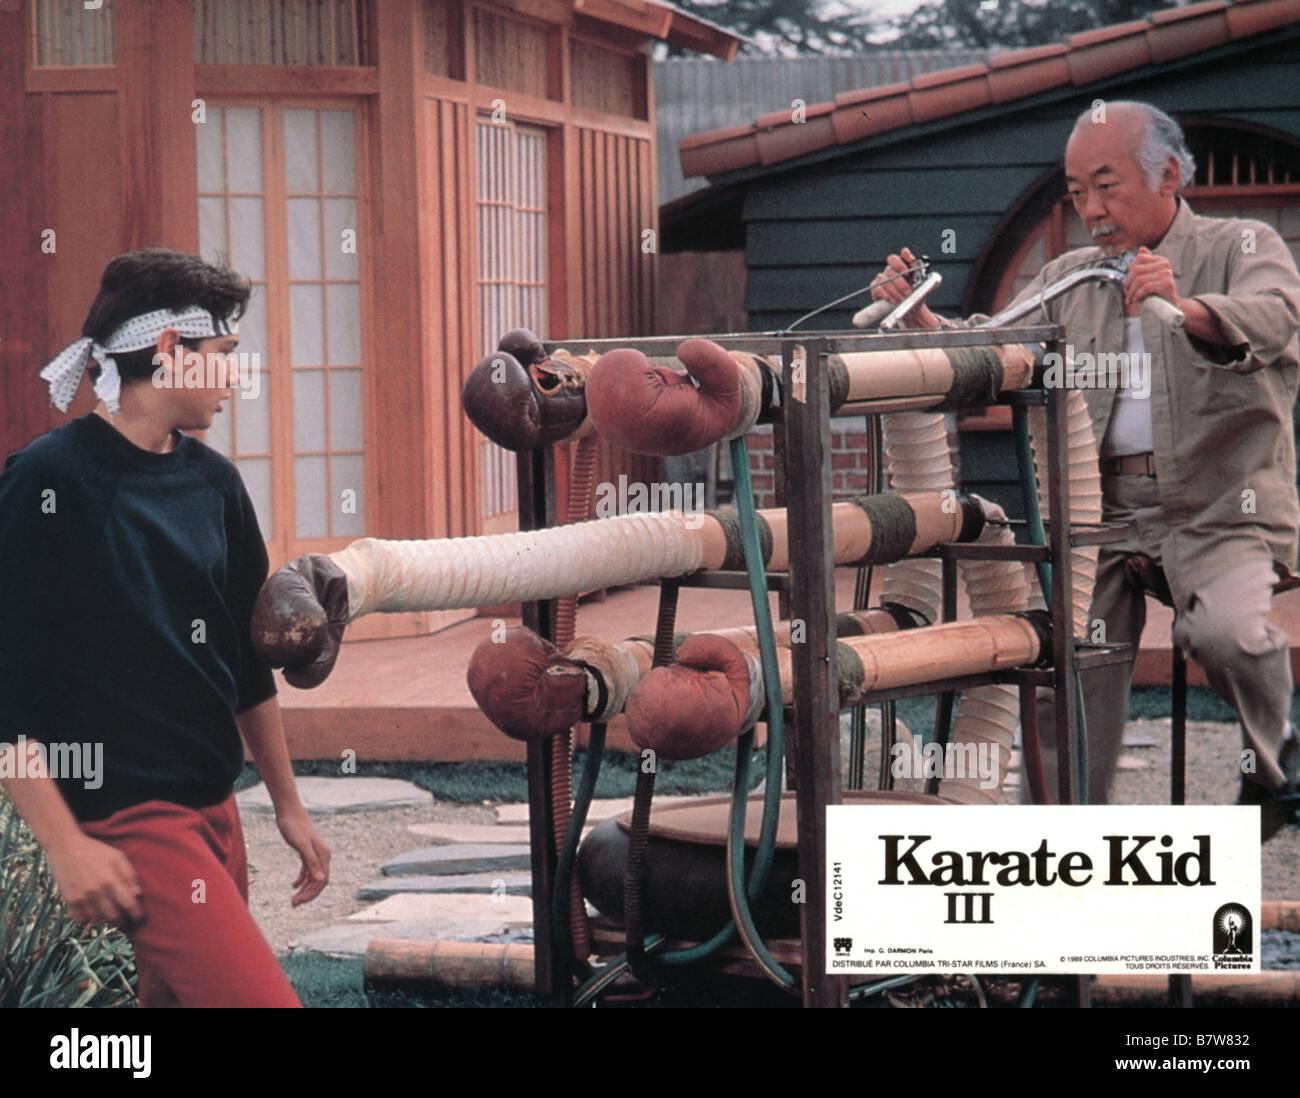 The Karate Kid, Part III  Year: 1989 USA Ralph Macchio, Pat Morita  Director: John G. Avildsen - Stock Image